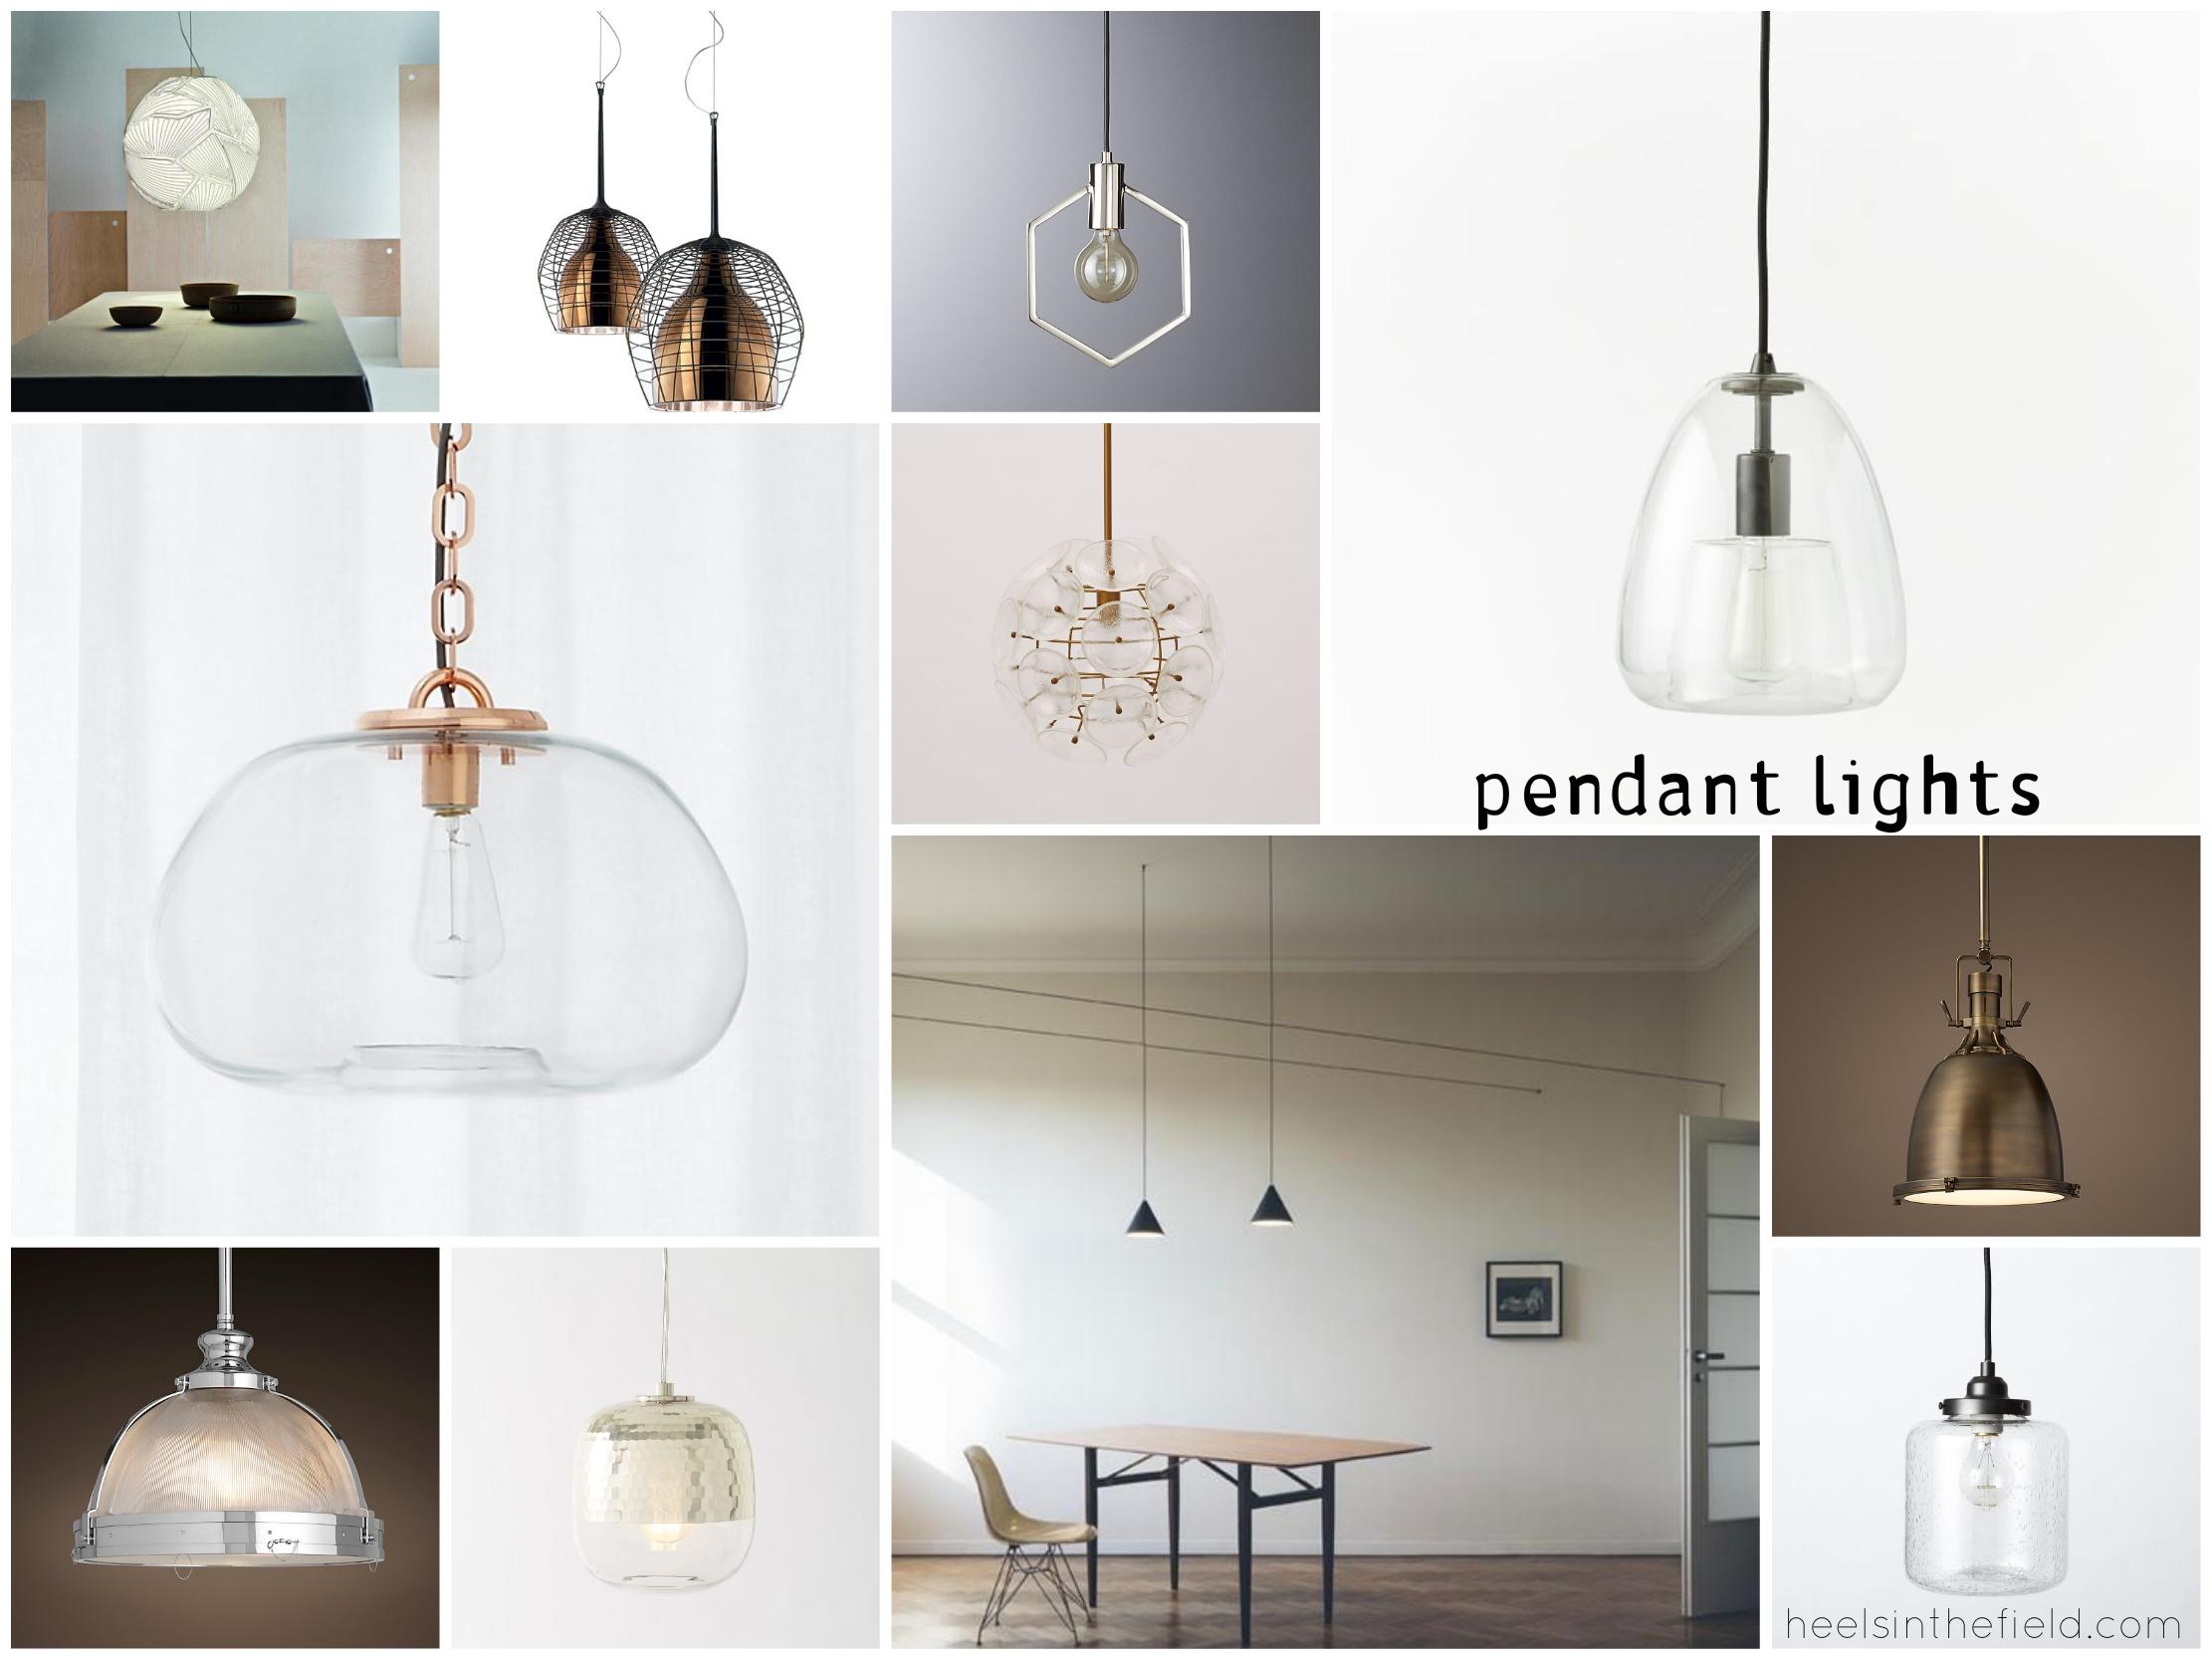 Pendant lighting inspiration board. (West Elm + Canada Lighting Experts)